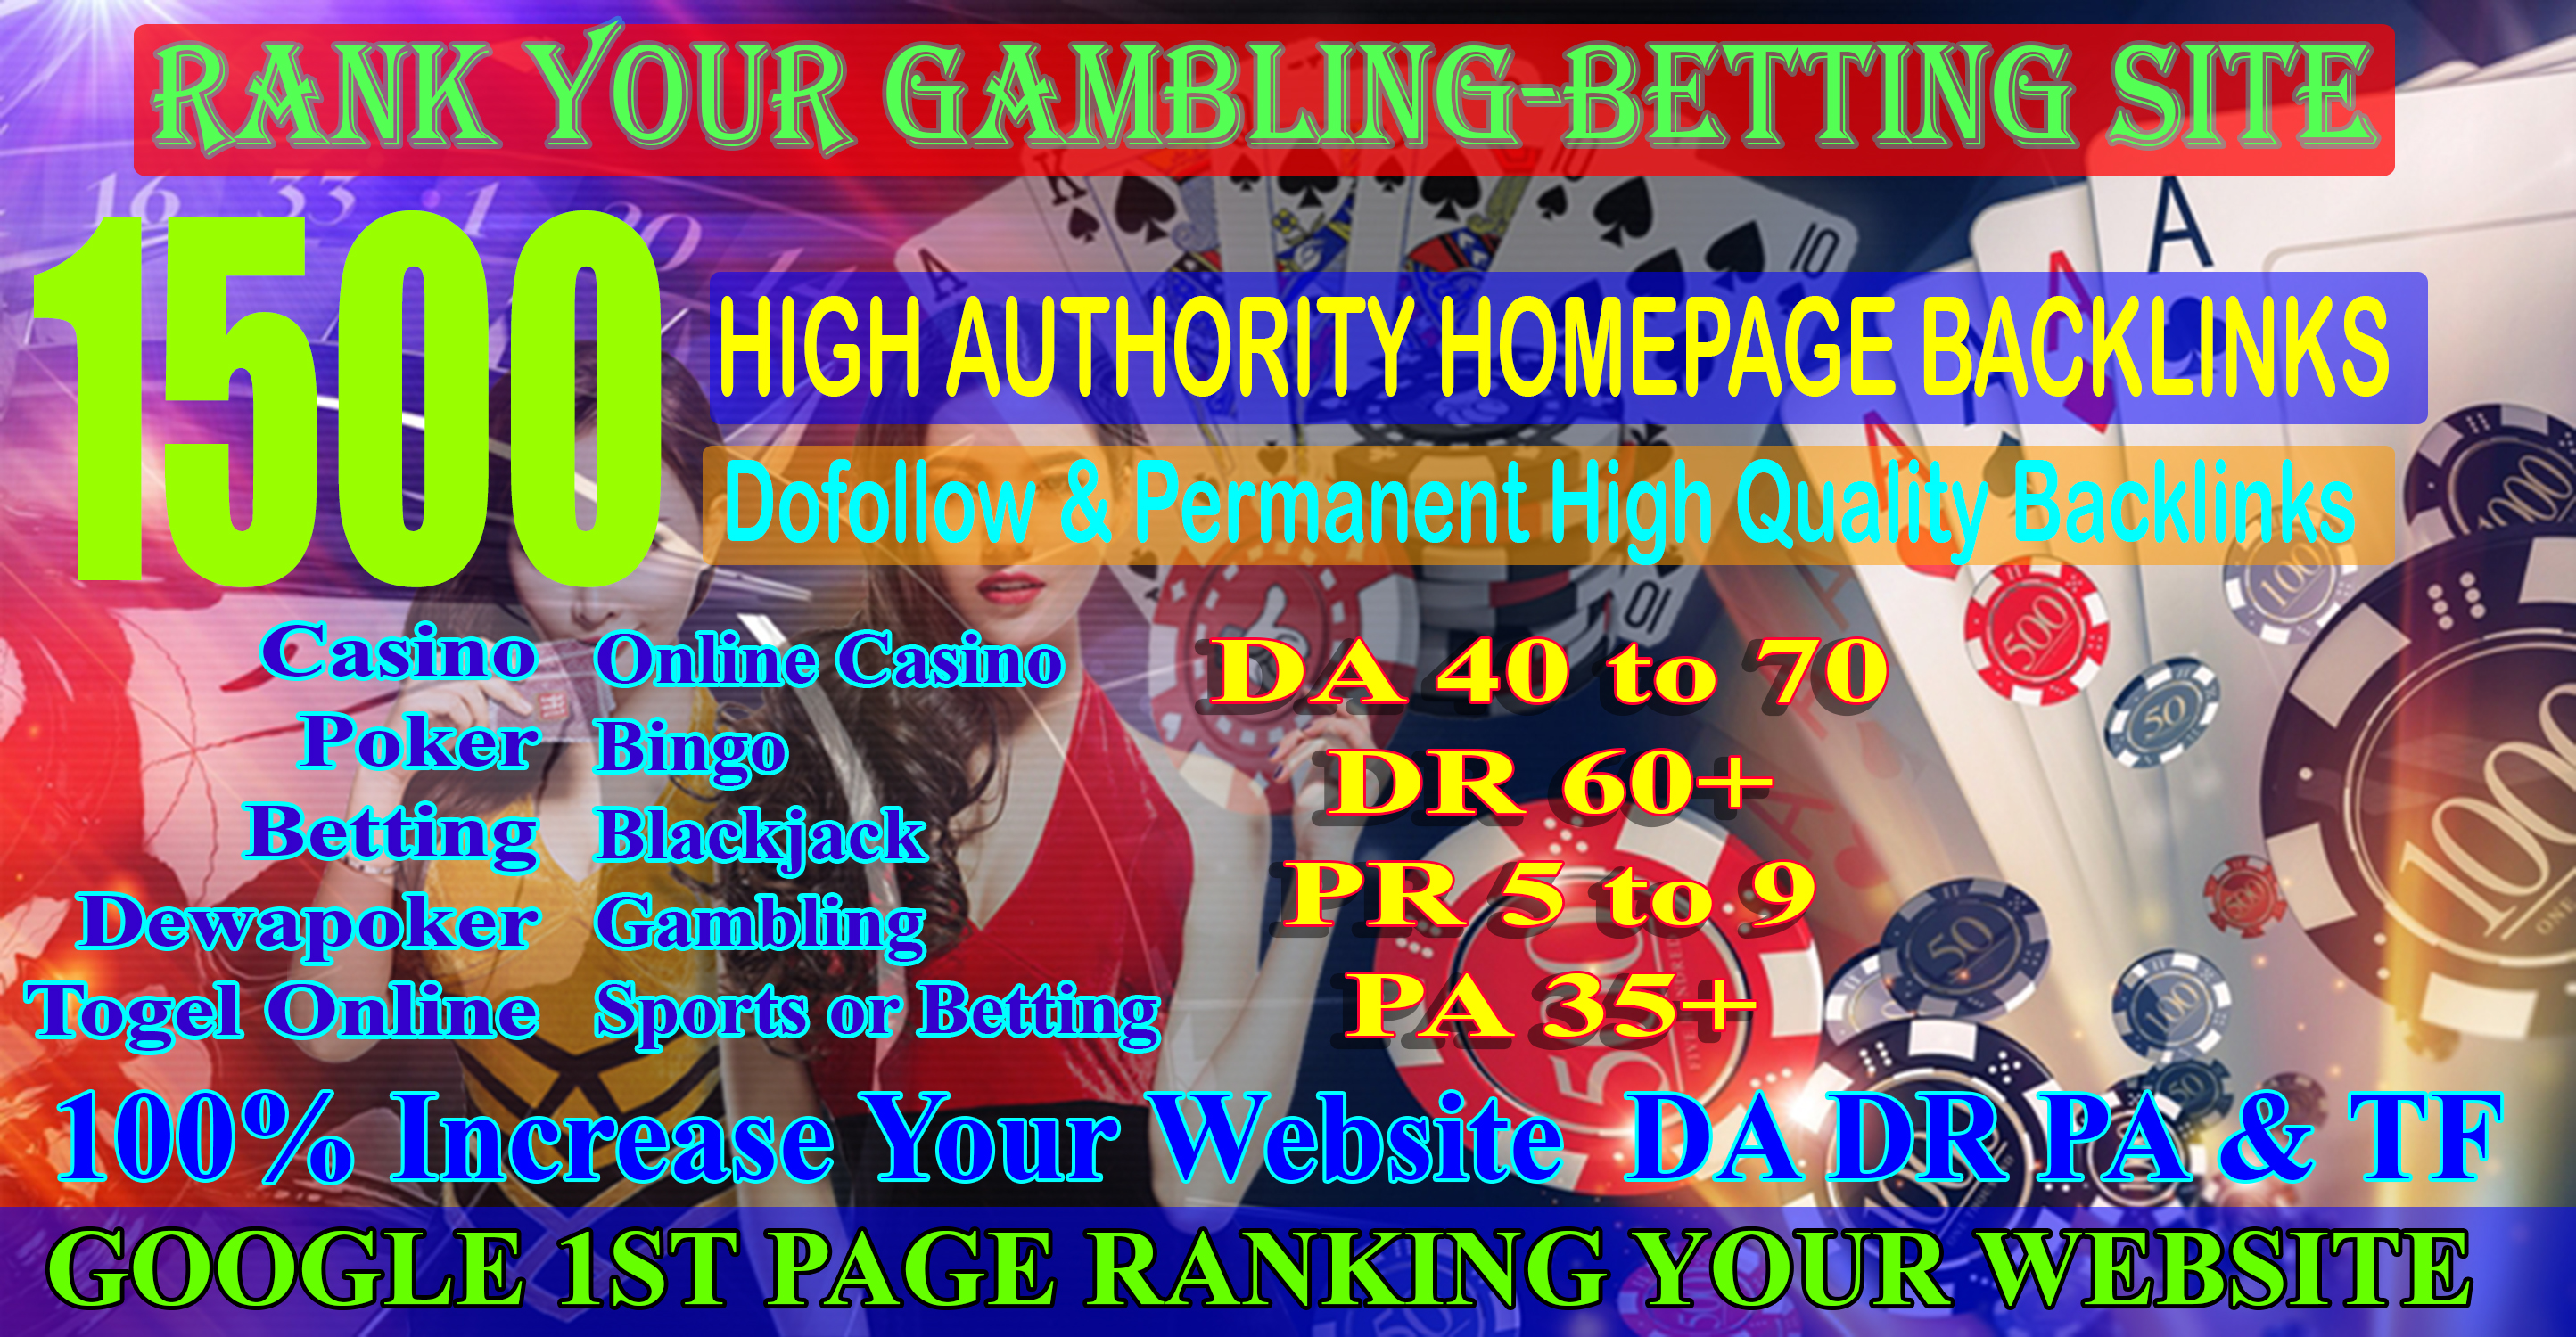 1500 CASINO, Poker, Gambling, Judi bola, High Quality With DA70+ DR60+ Homepage Backlinks